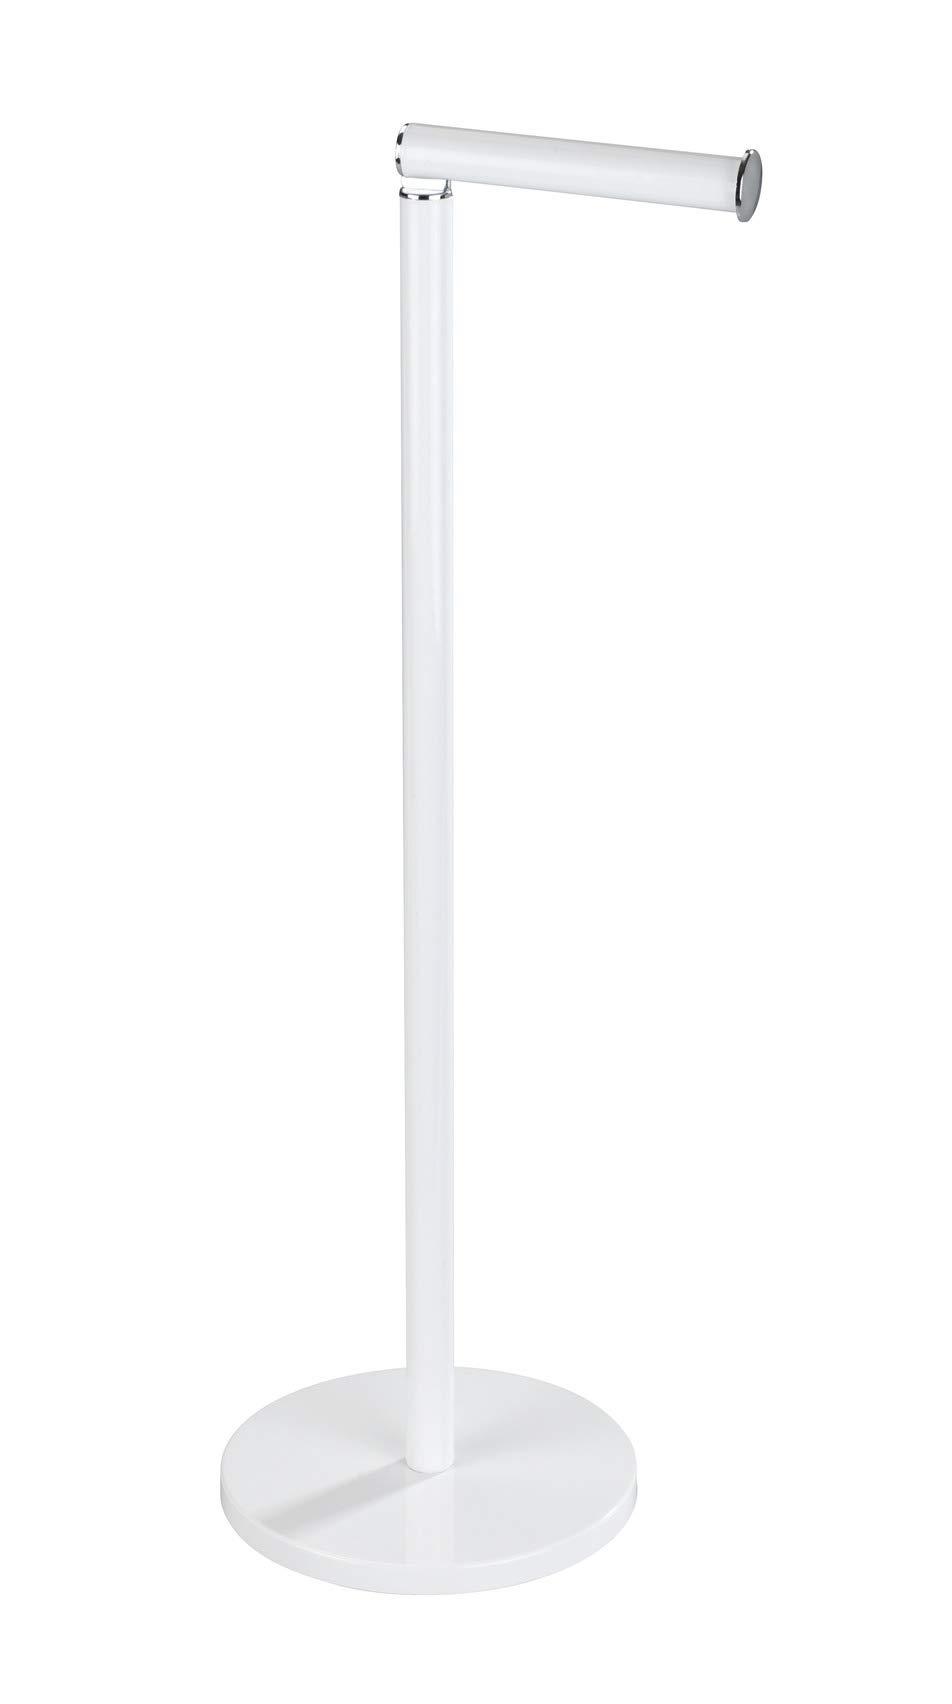 WENKO 21424100 Free Standing Toilet Paper Holder, 8.3 x 21.7 x 6.7 inch, White